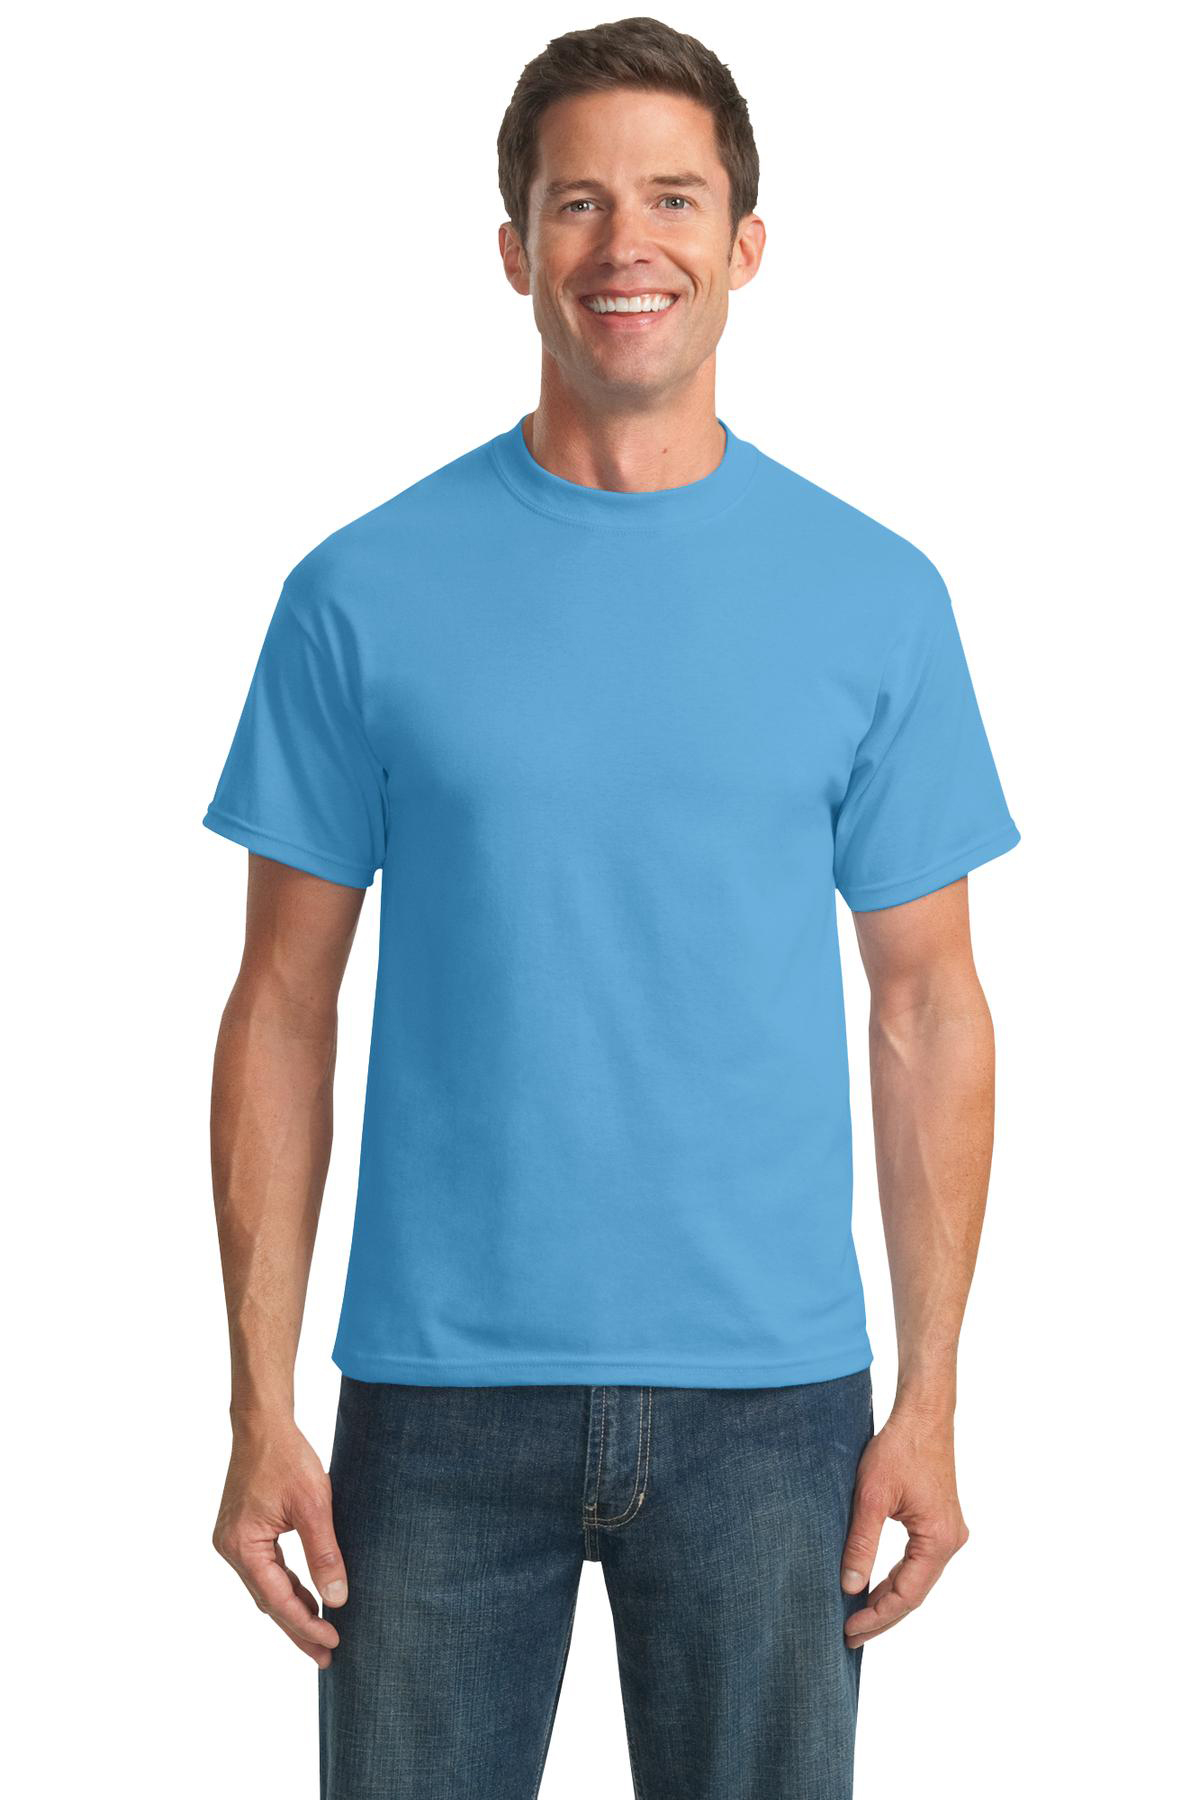 592d4a787124 Port & Company® Tall Core Blend Tee | 50/50 Blend | T-Shirts | SanMar